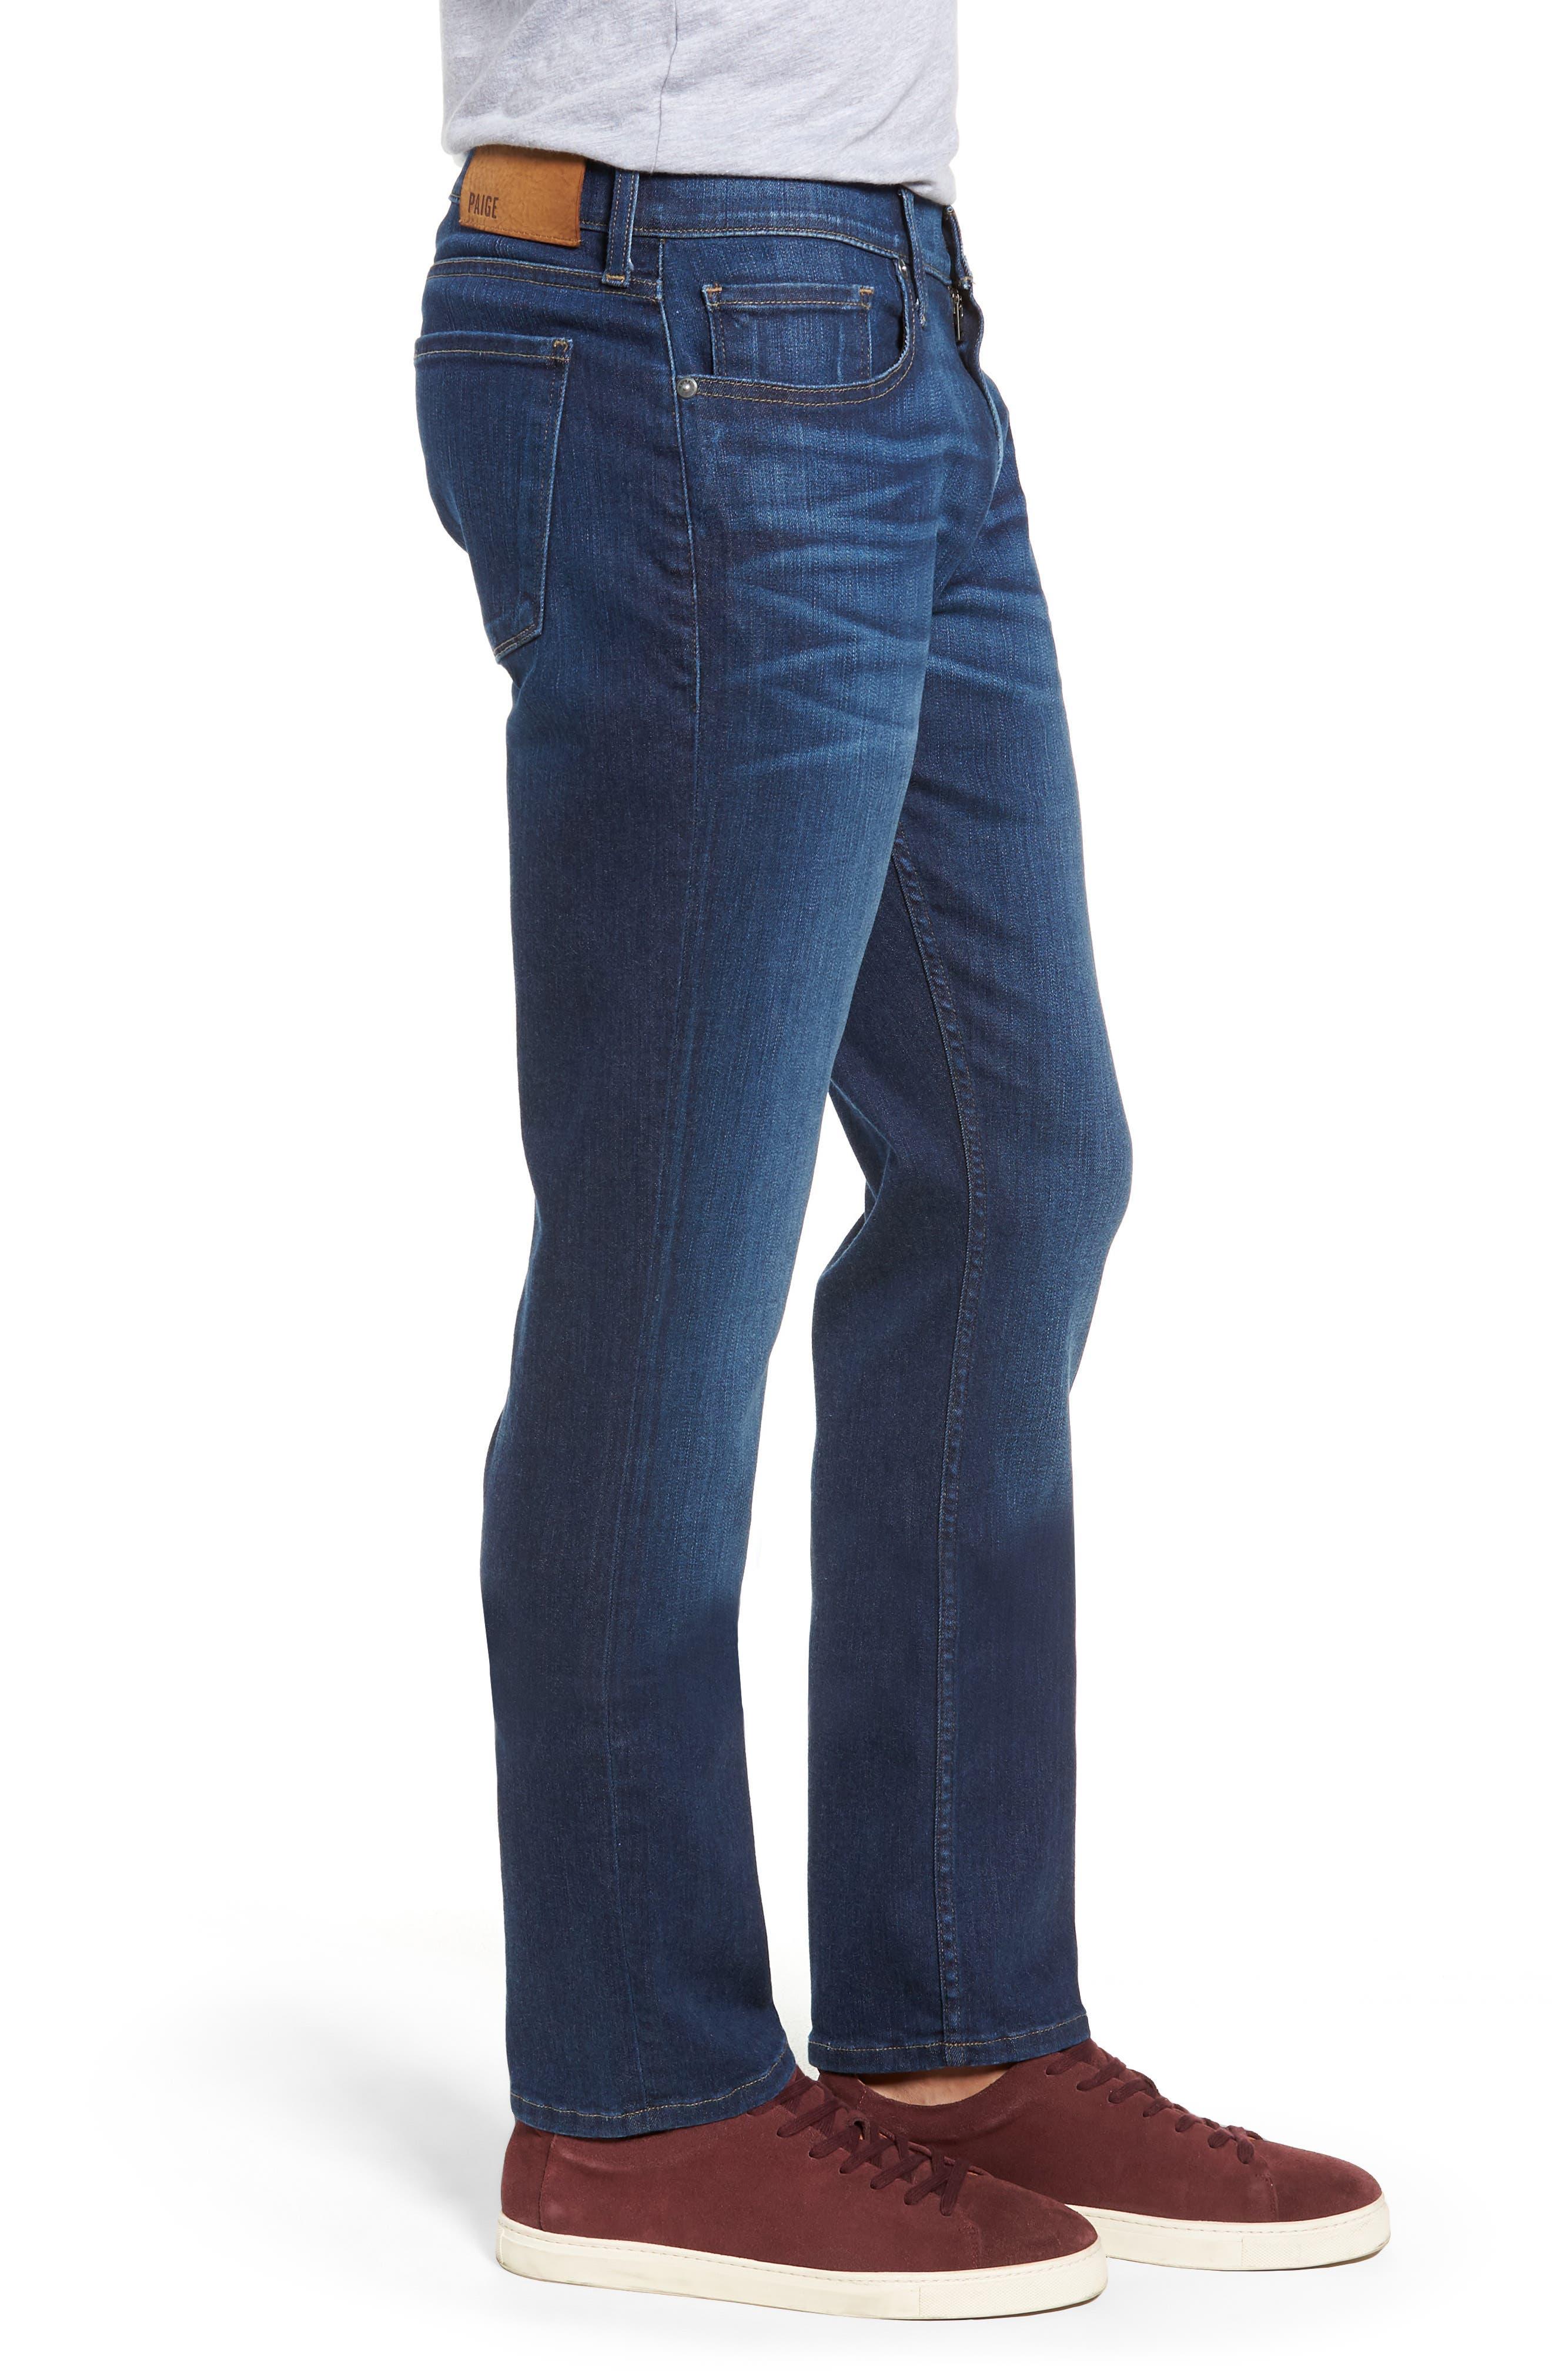 Transcend Vintage - Federal Slim Straight Leg Jeans,                             Alternate thumbnail 3, color,                             ELWYN